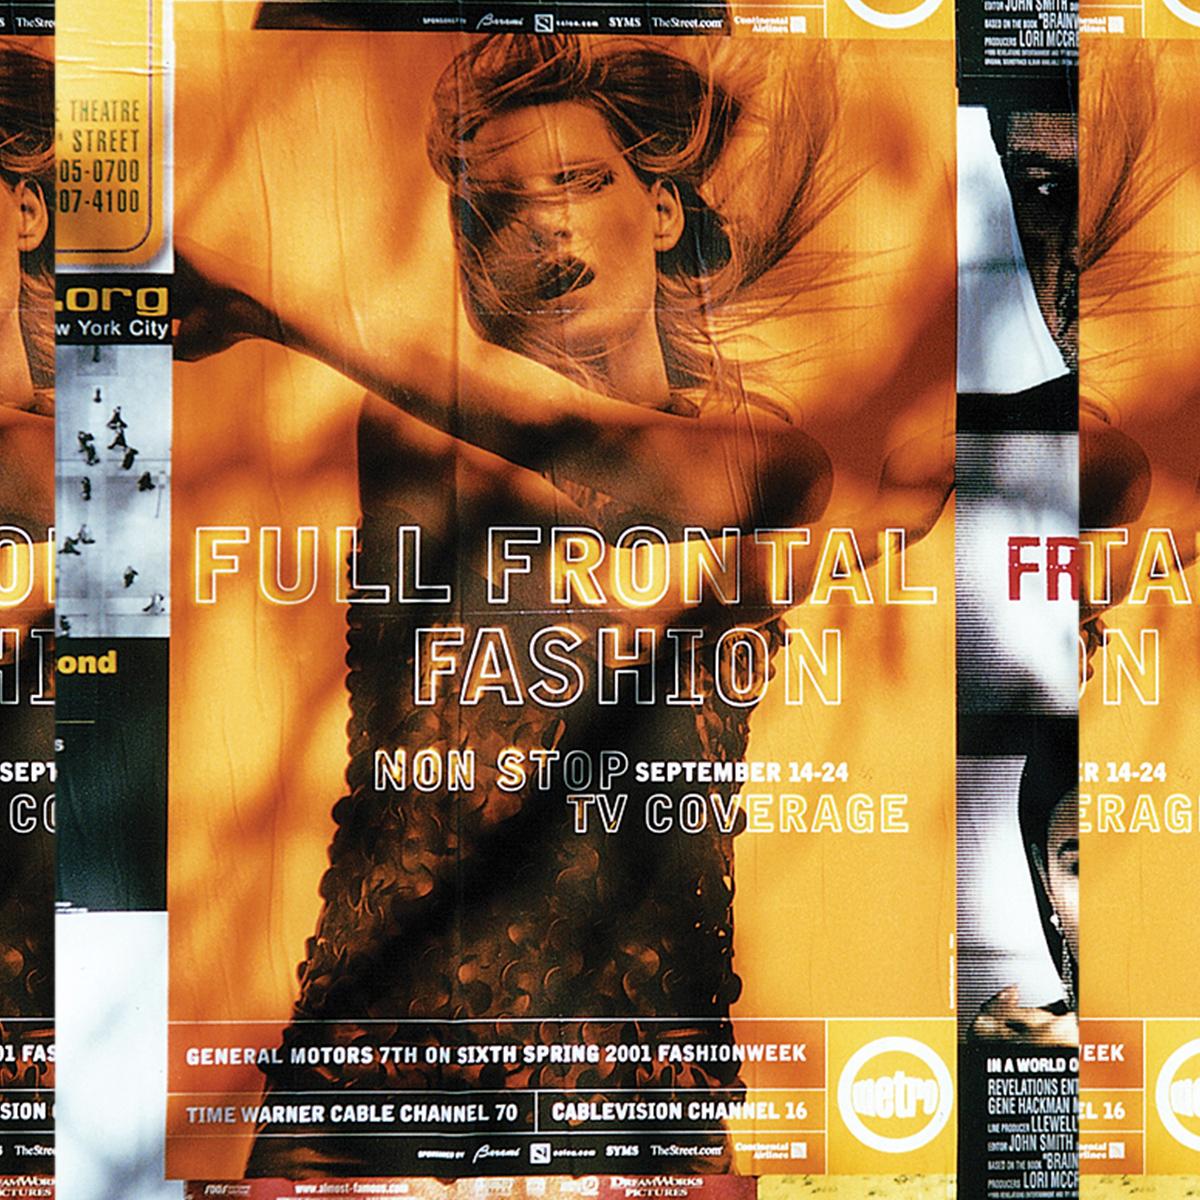 FFF_Poster_Street_Square_1200x1200